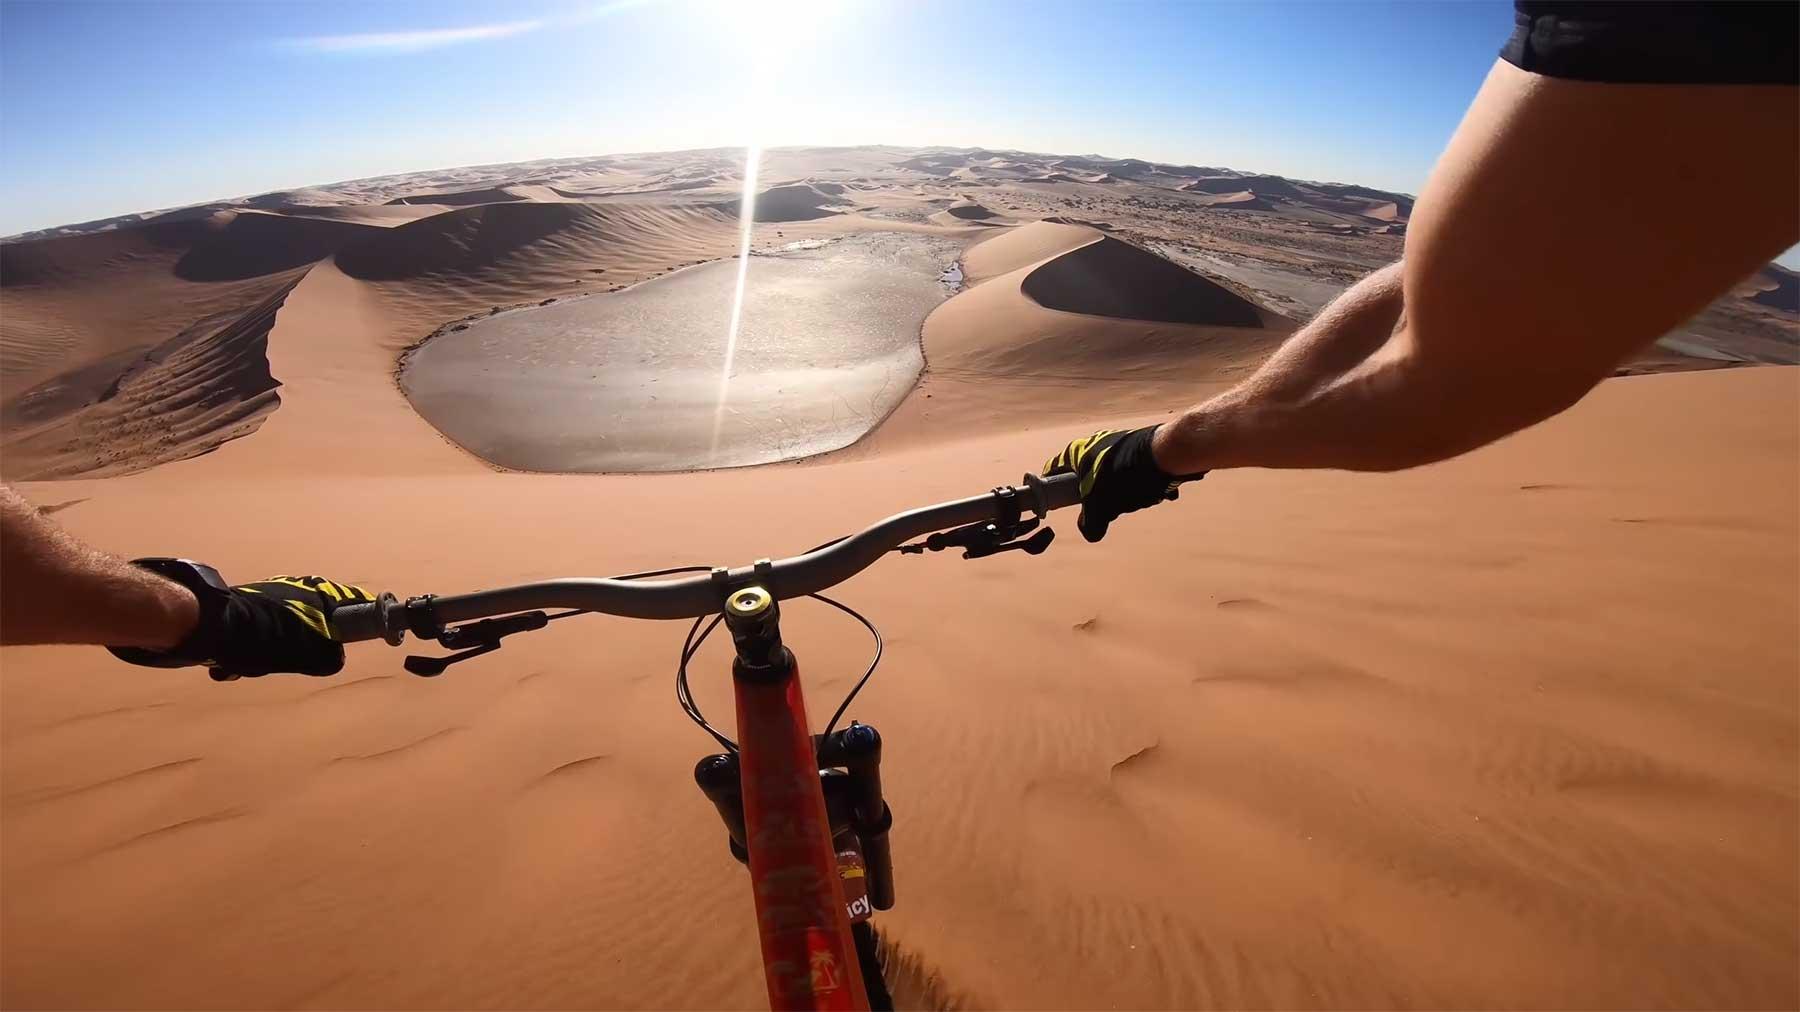 POV-Fahrt: Mit dem Fahrrad die Sanddüne runter fahren